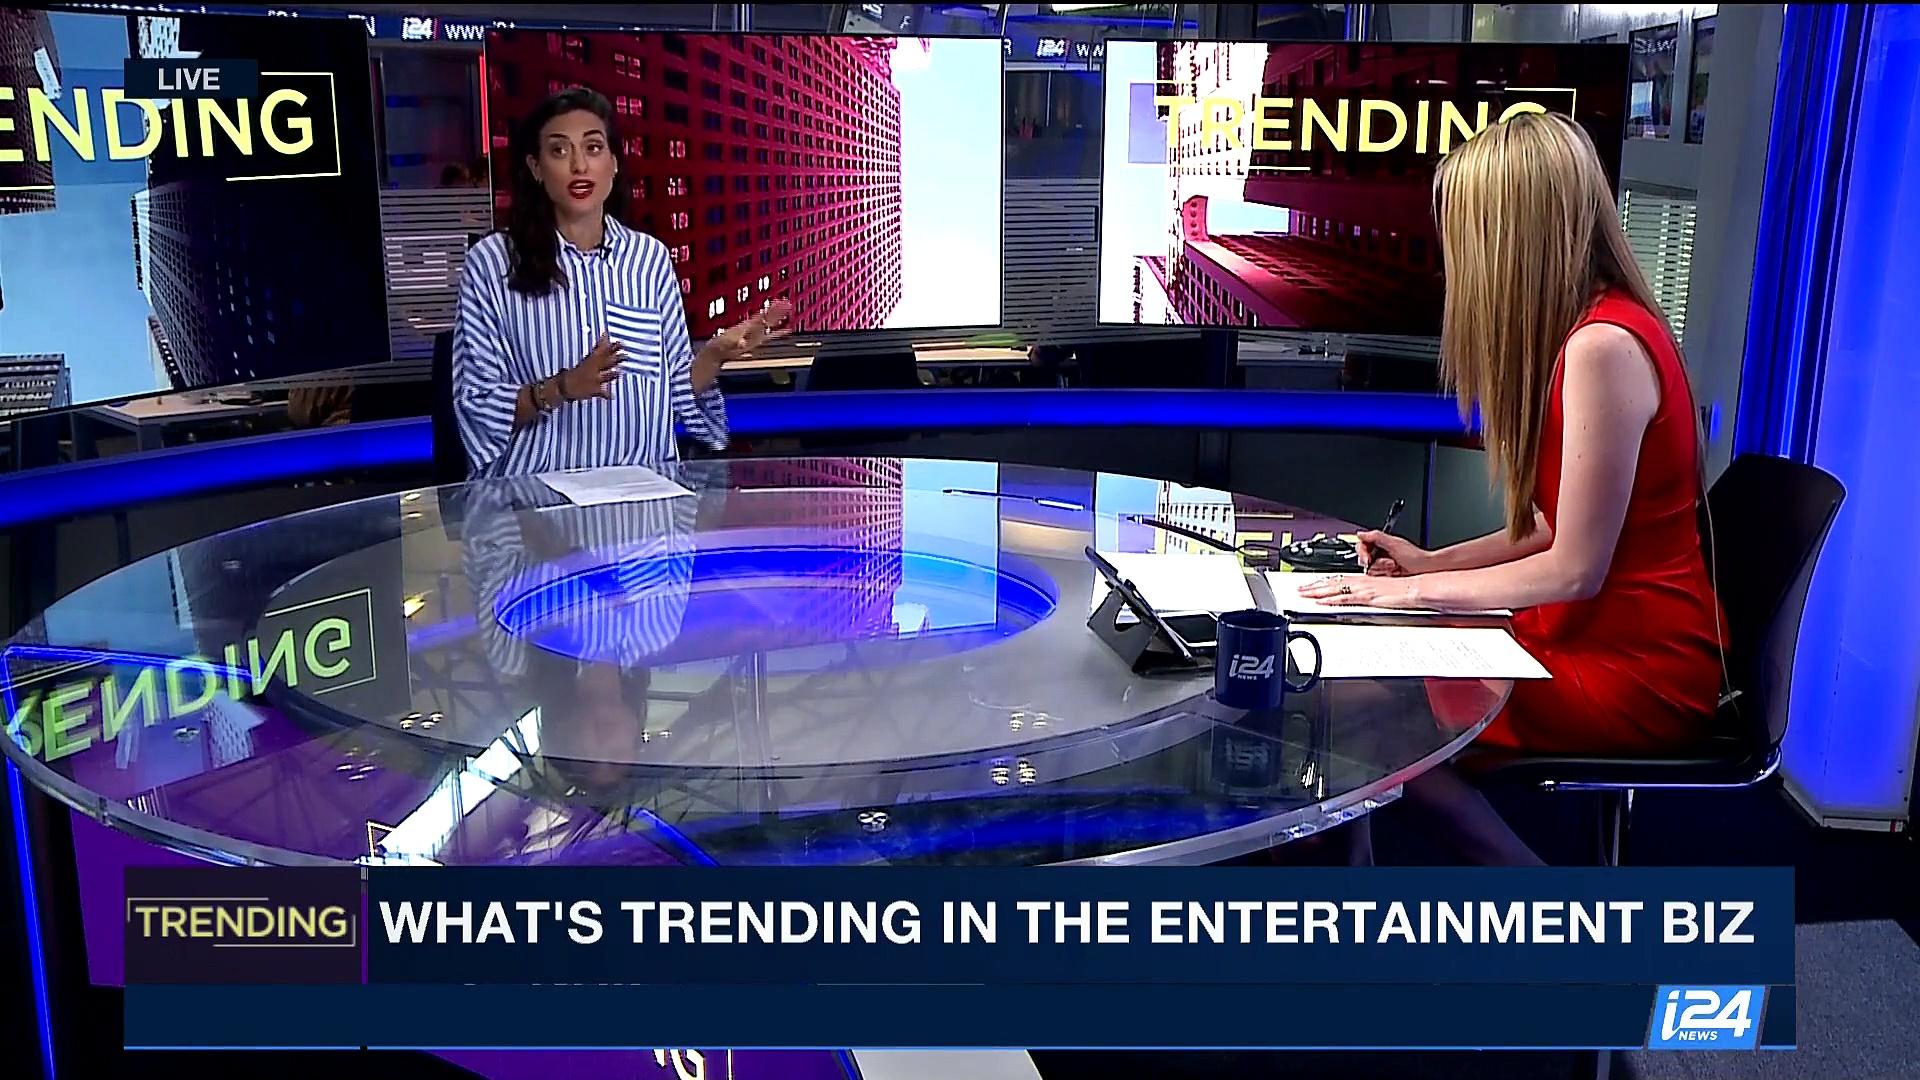 TRENDING   What's trending in the entertainment biz   Thursday, May 11th 2017